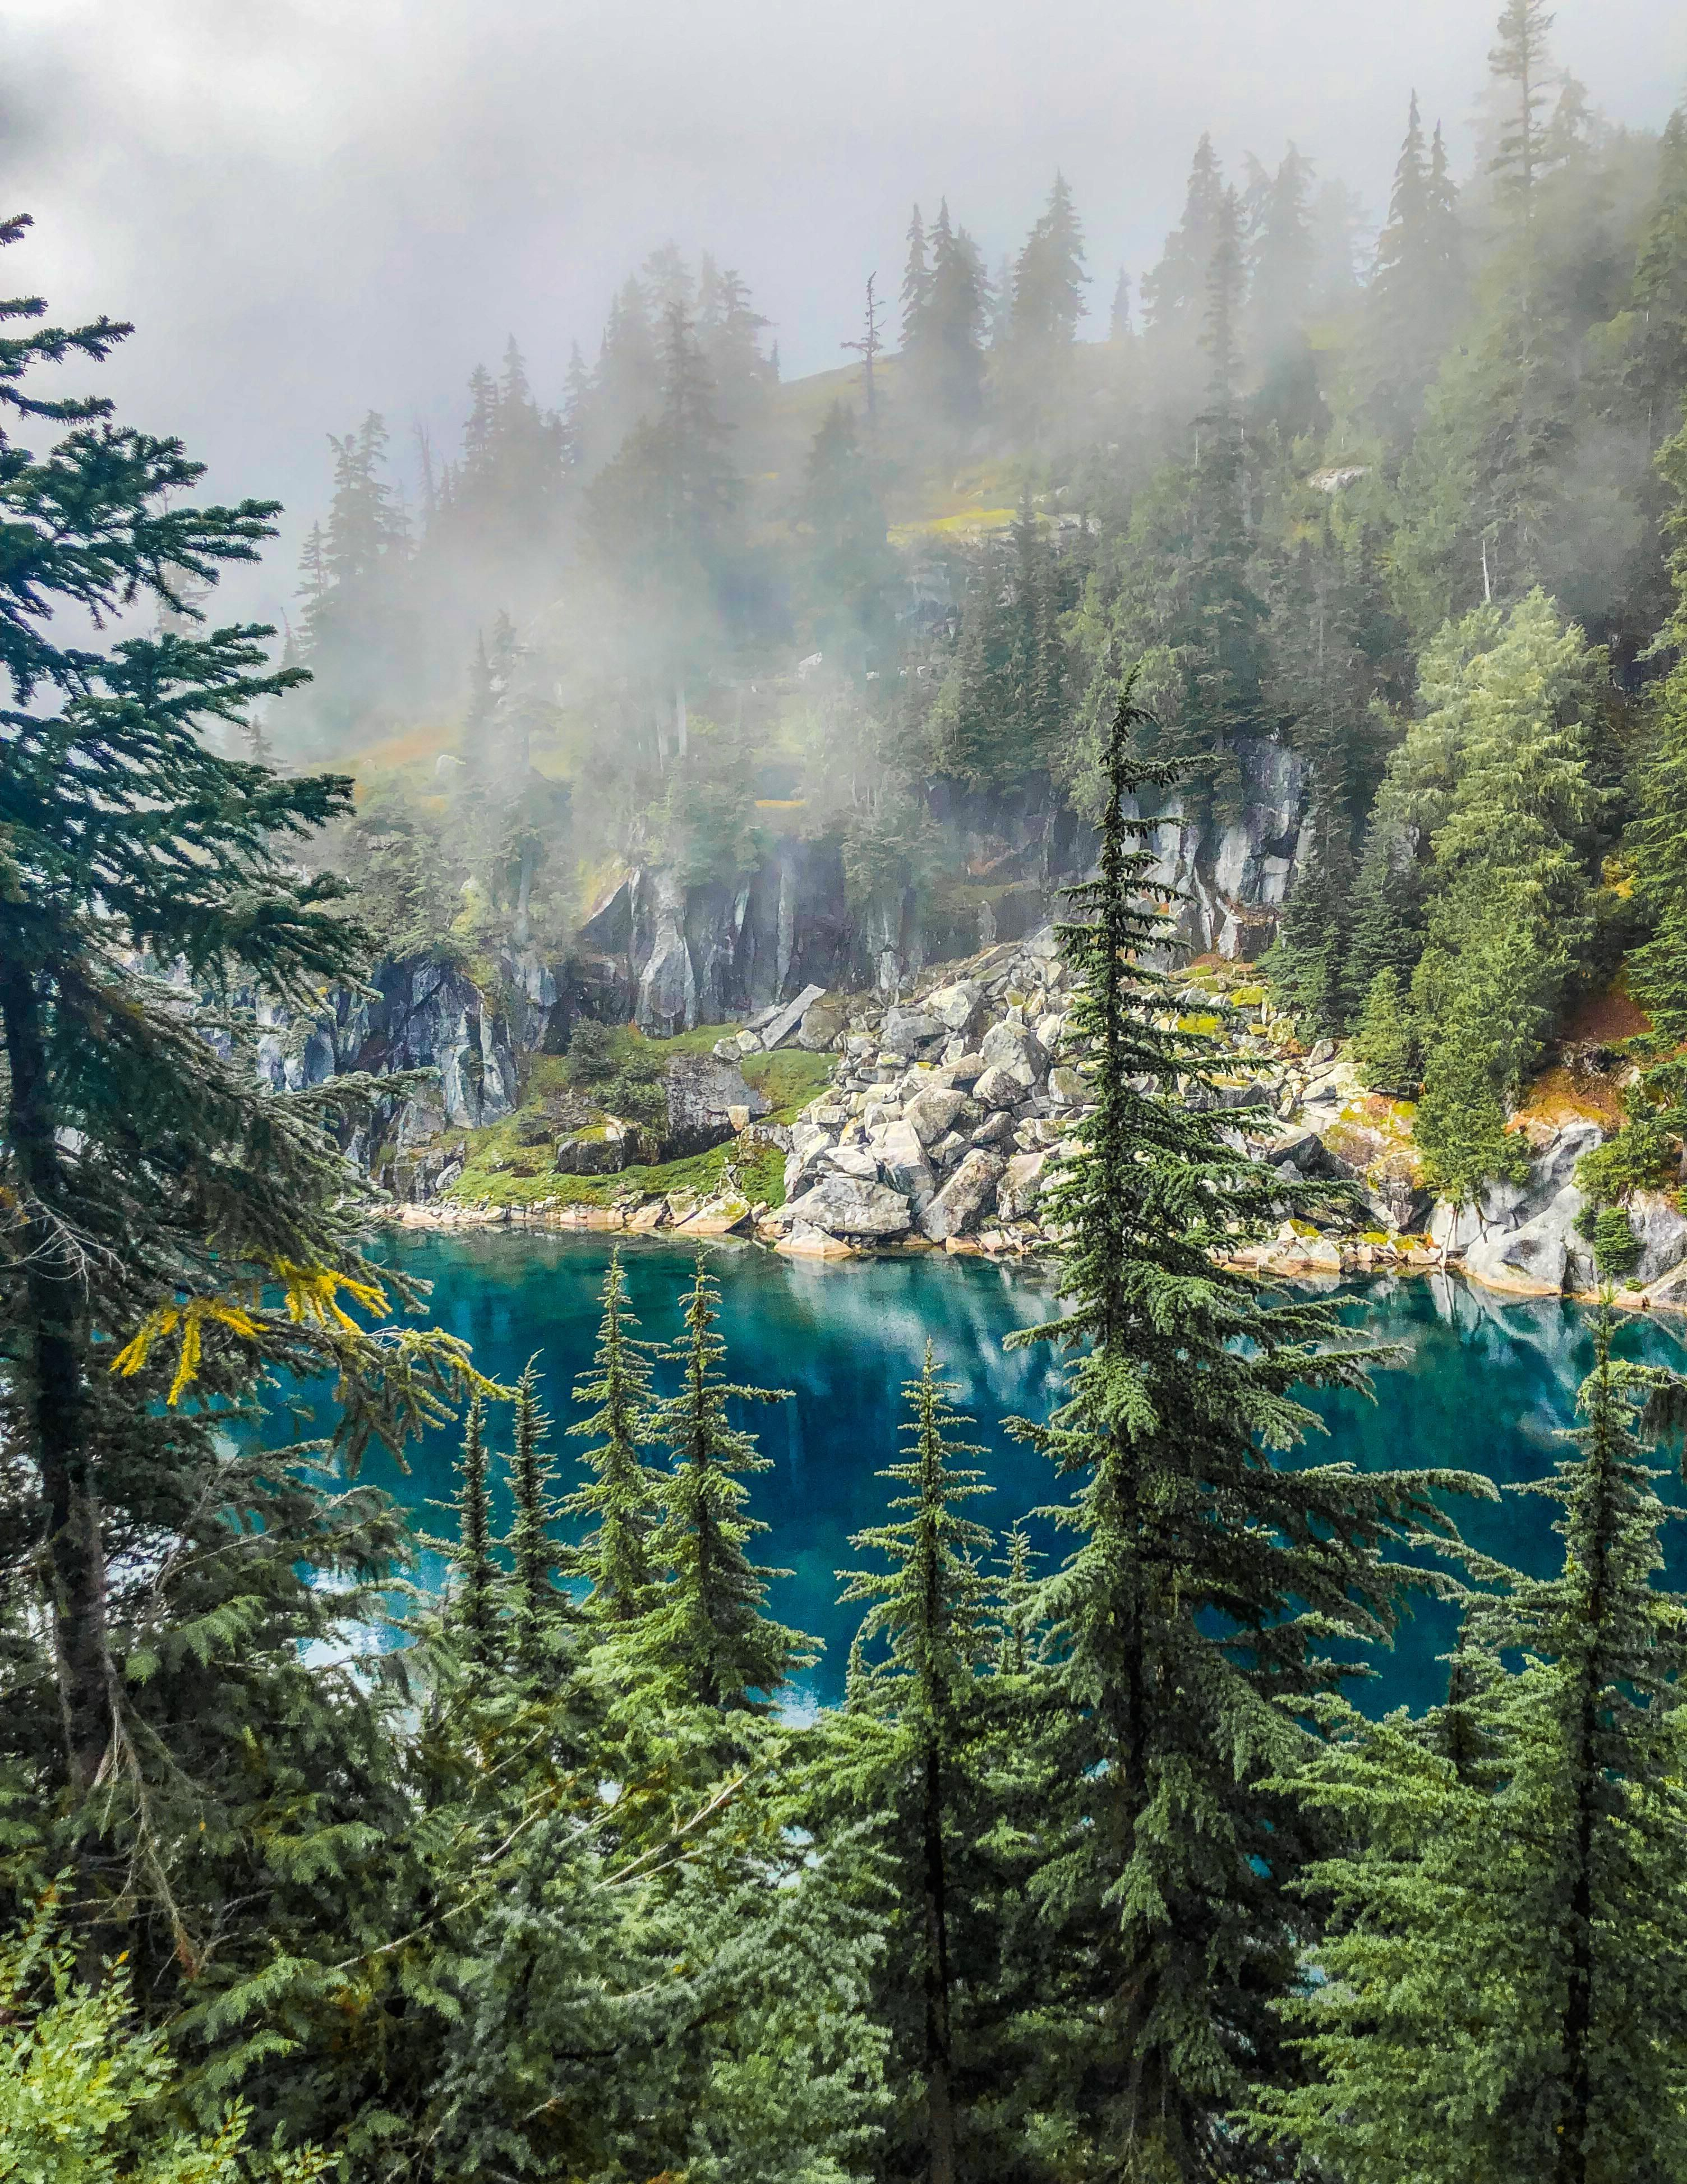 That perfect Washington weather. Alpine Lakes Wilderness